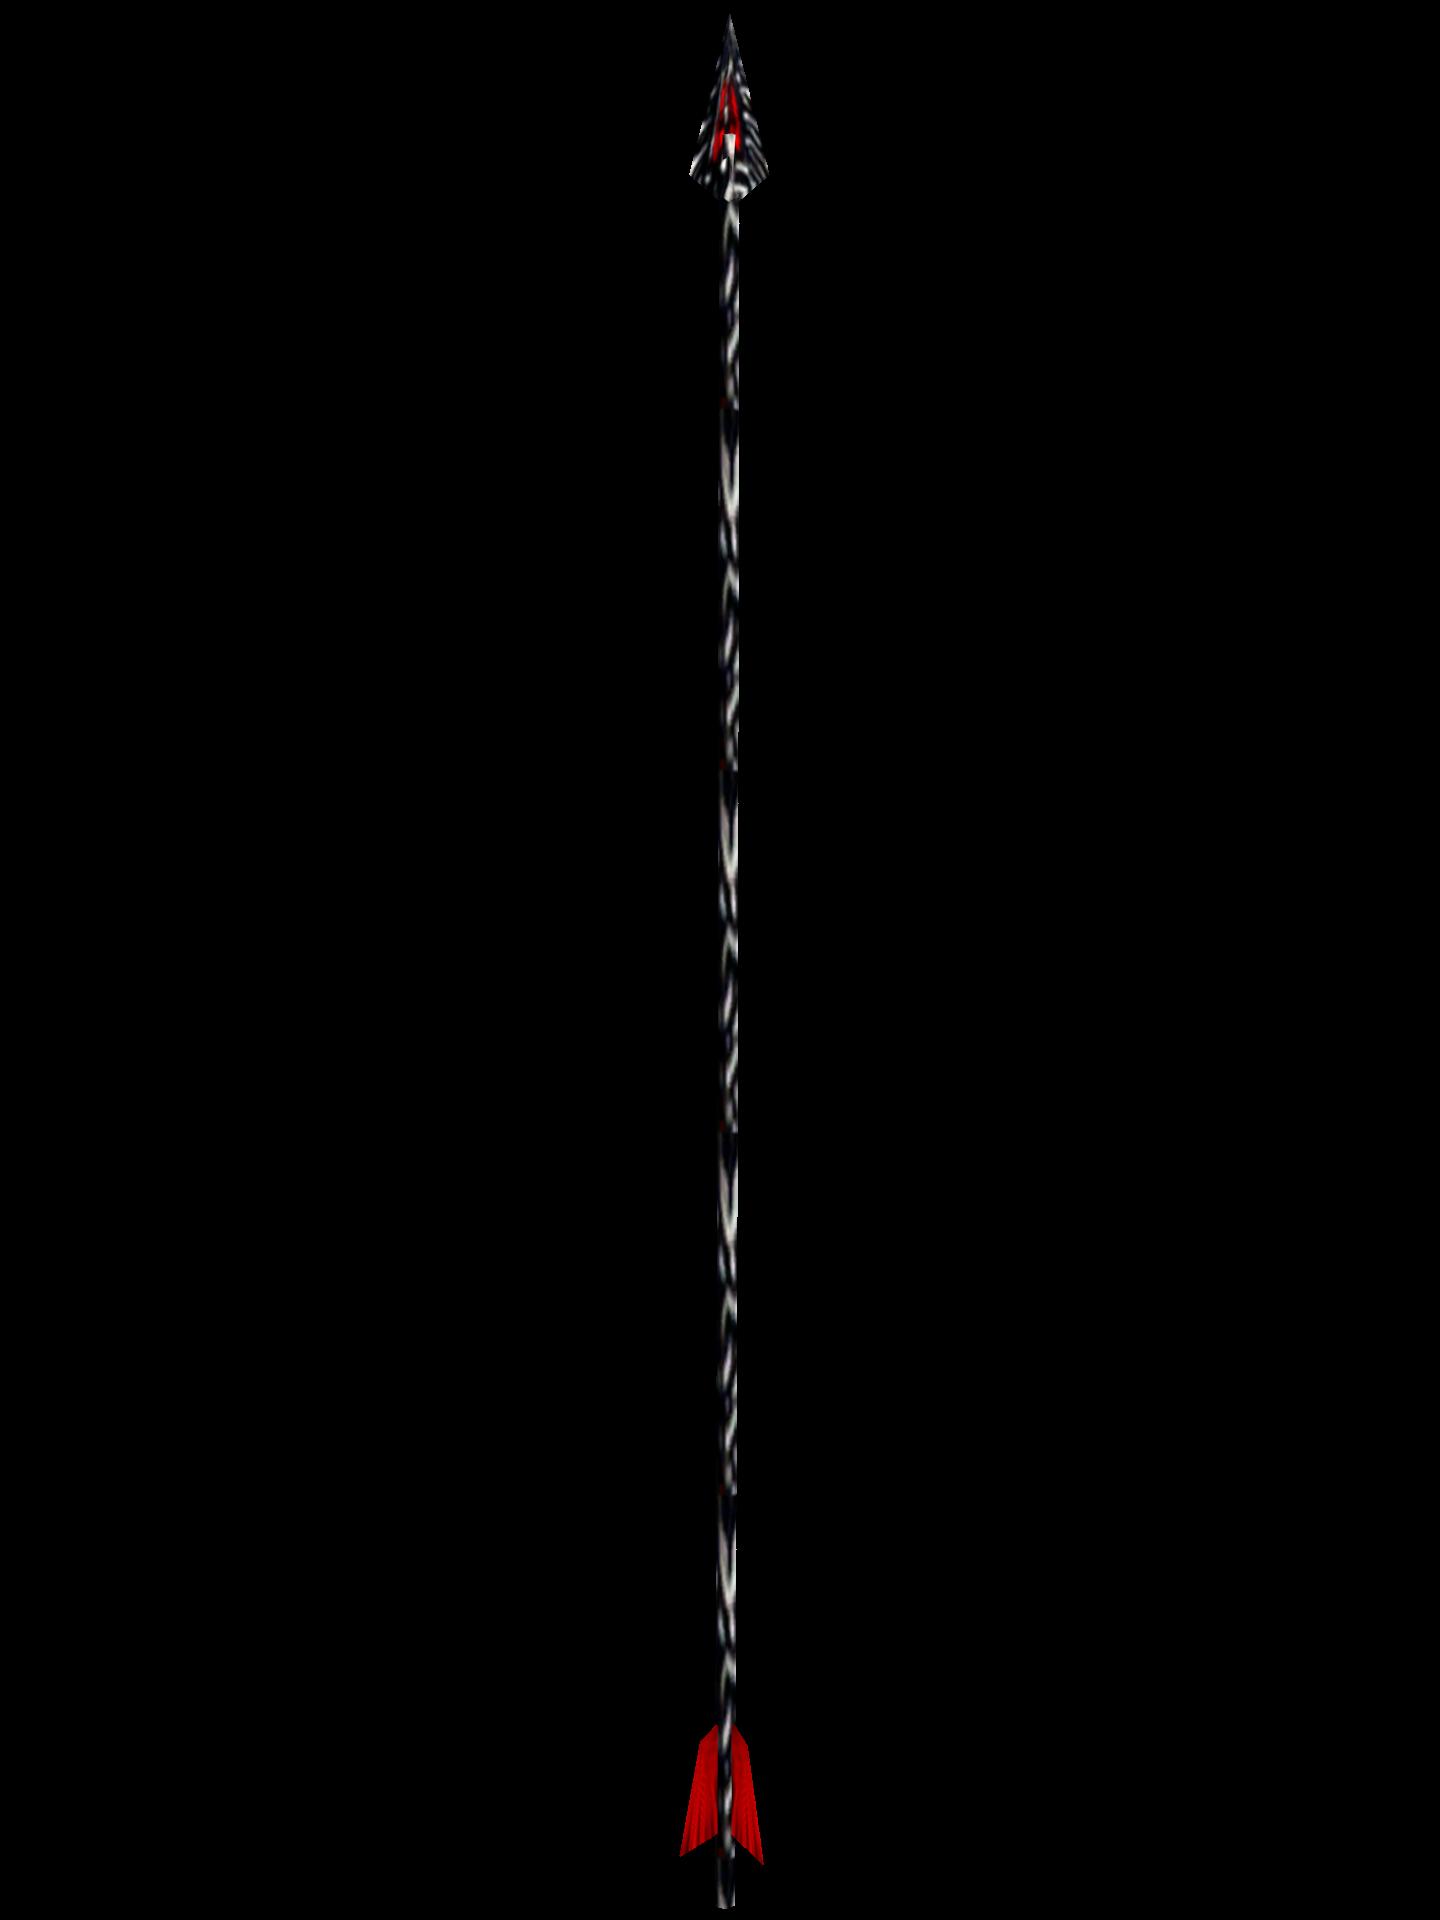 Skyrim - Infinite Daedric Arrow Glitch - YouTube |Daedric Arrows